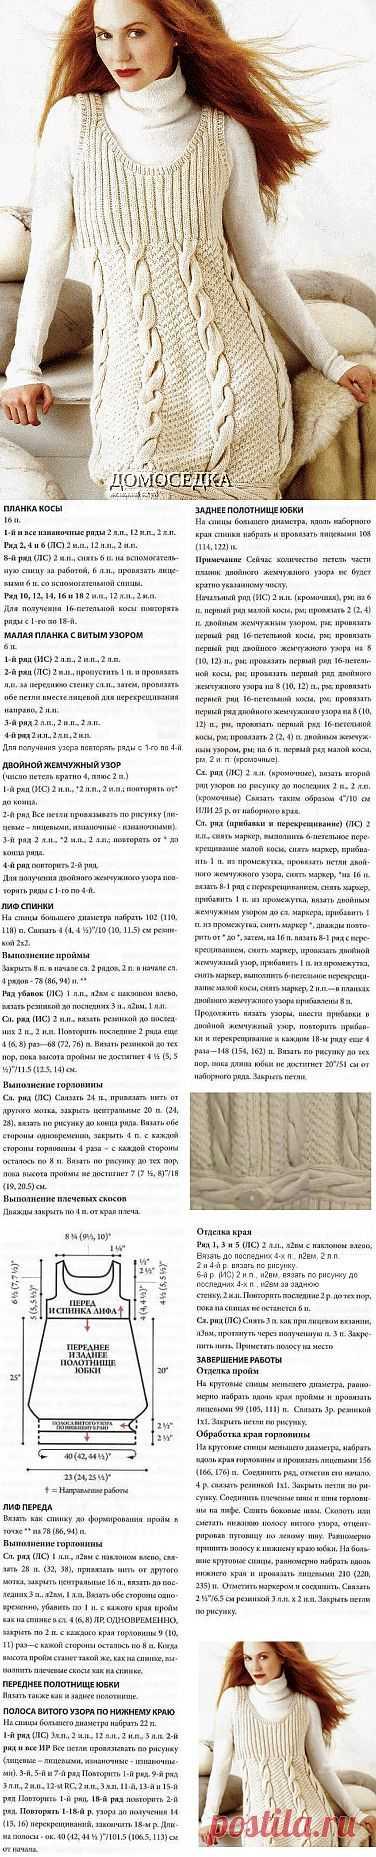 Блоги@Mail.Ru: Белый теплый вязаный сарафан от Деборы Ньютон